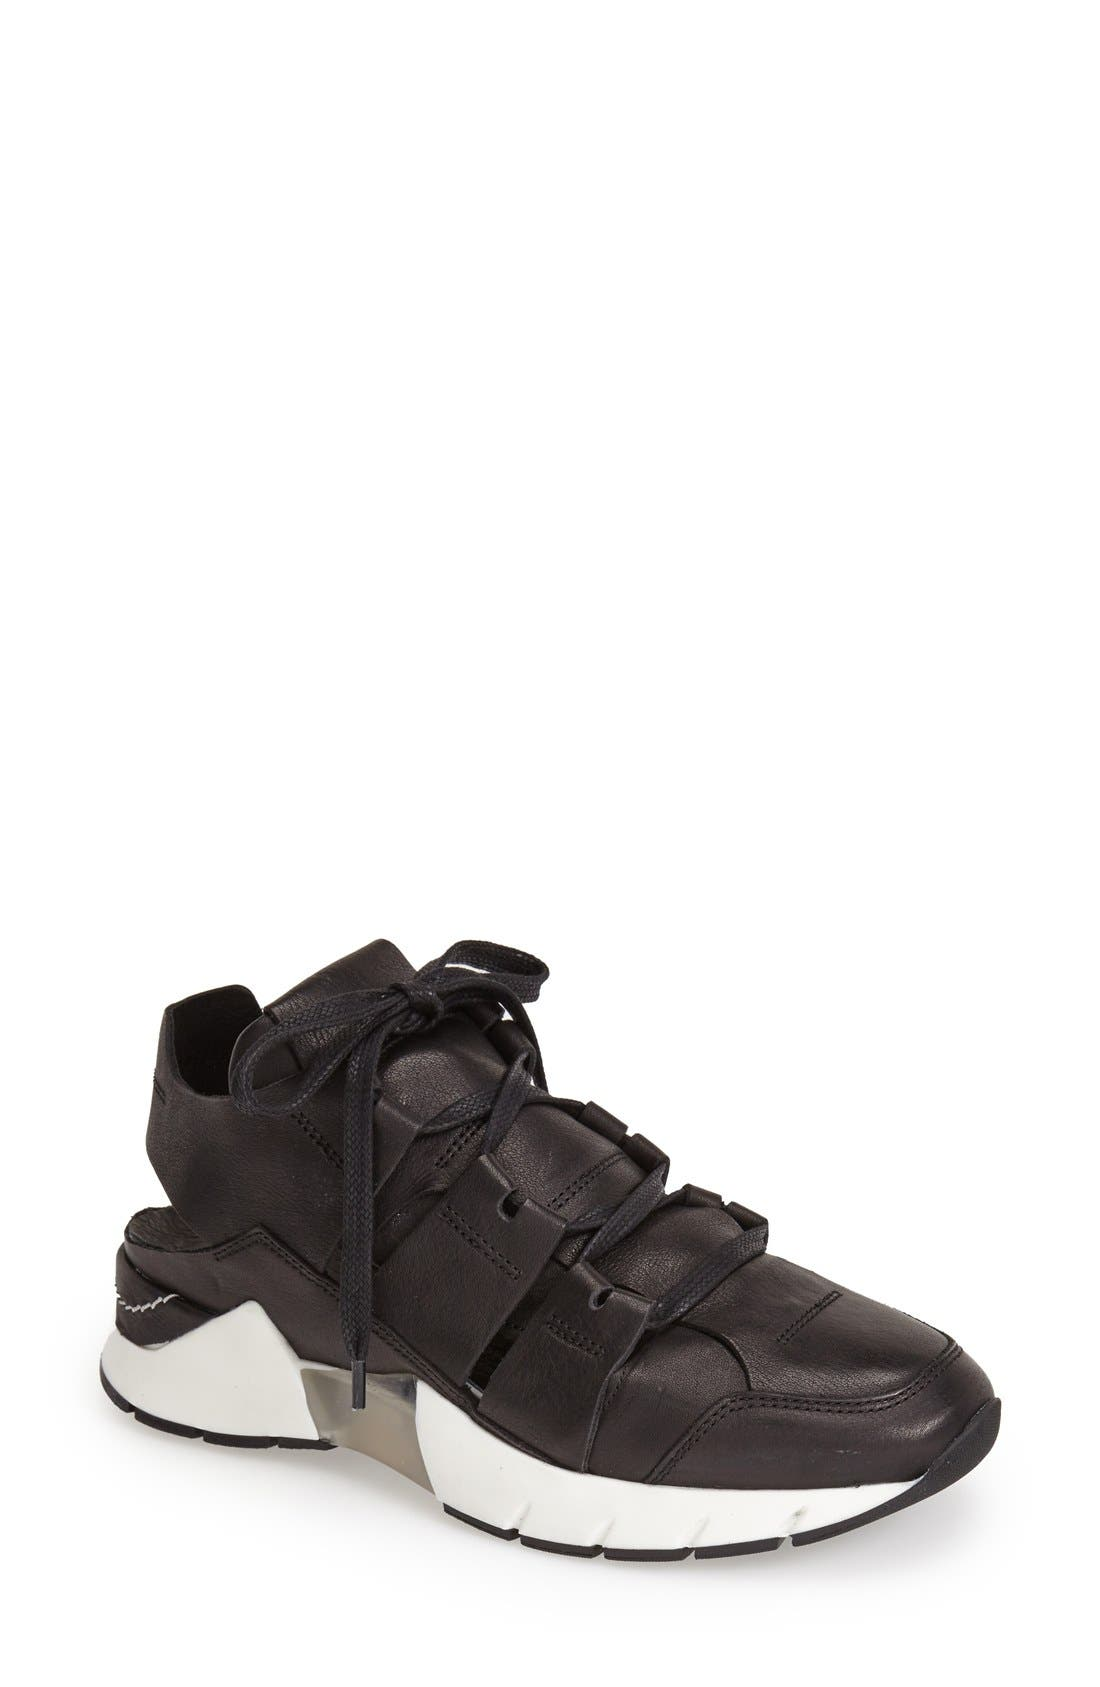 Alternate Image 1 Selected - CA by CINZIA ARAIA Cutout Leather Sneaker (Women)